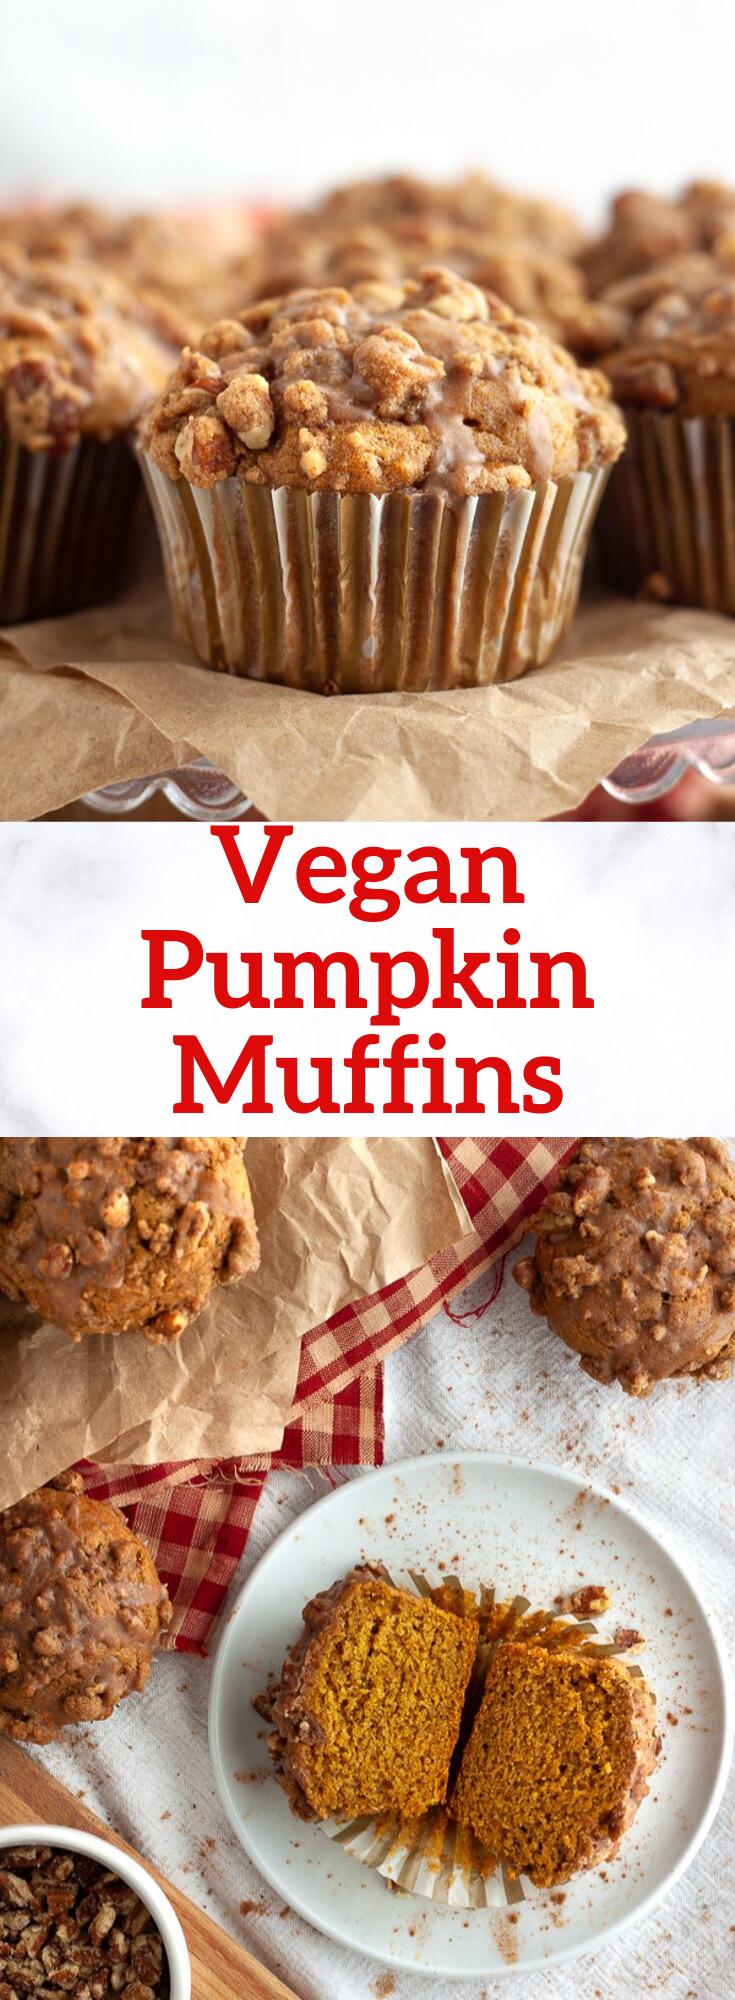 Vegan Pumpkin Muffin Recipe | plant.well #pumpkinmuffins